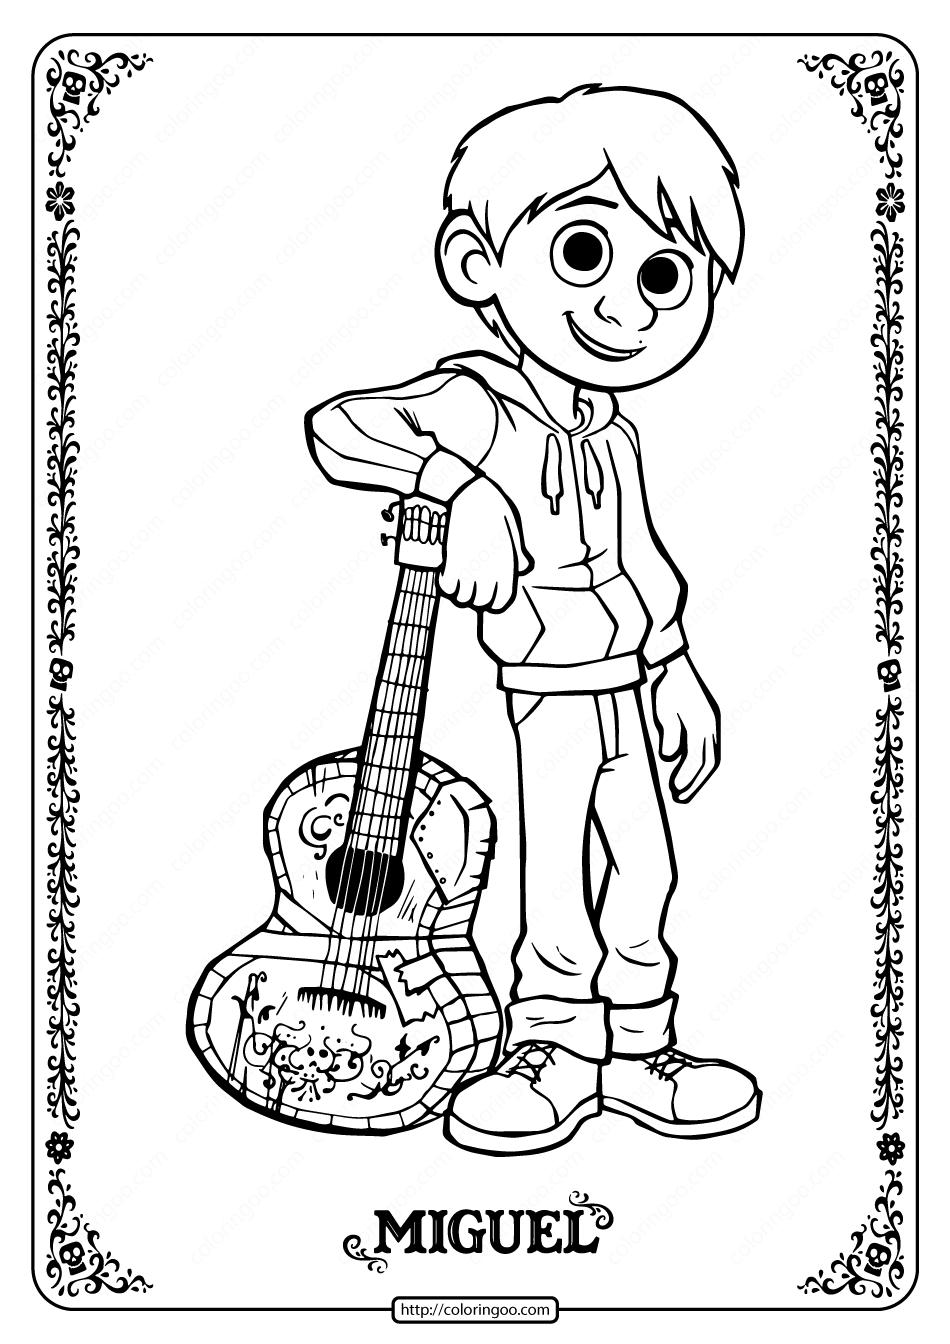 Printable Disney Coco Miguel Coloring Pages Coloring Pages Geometric Coloring Pages Coloring Pages For Boys